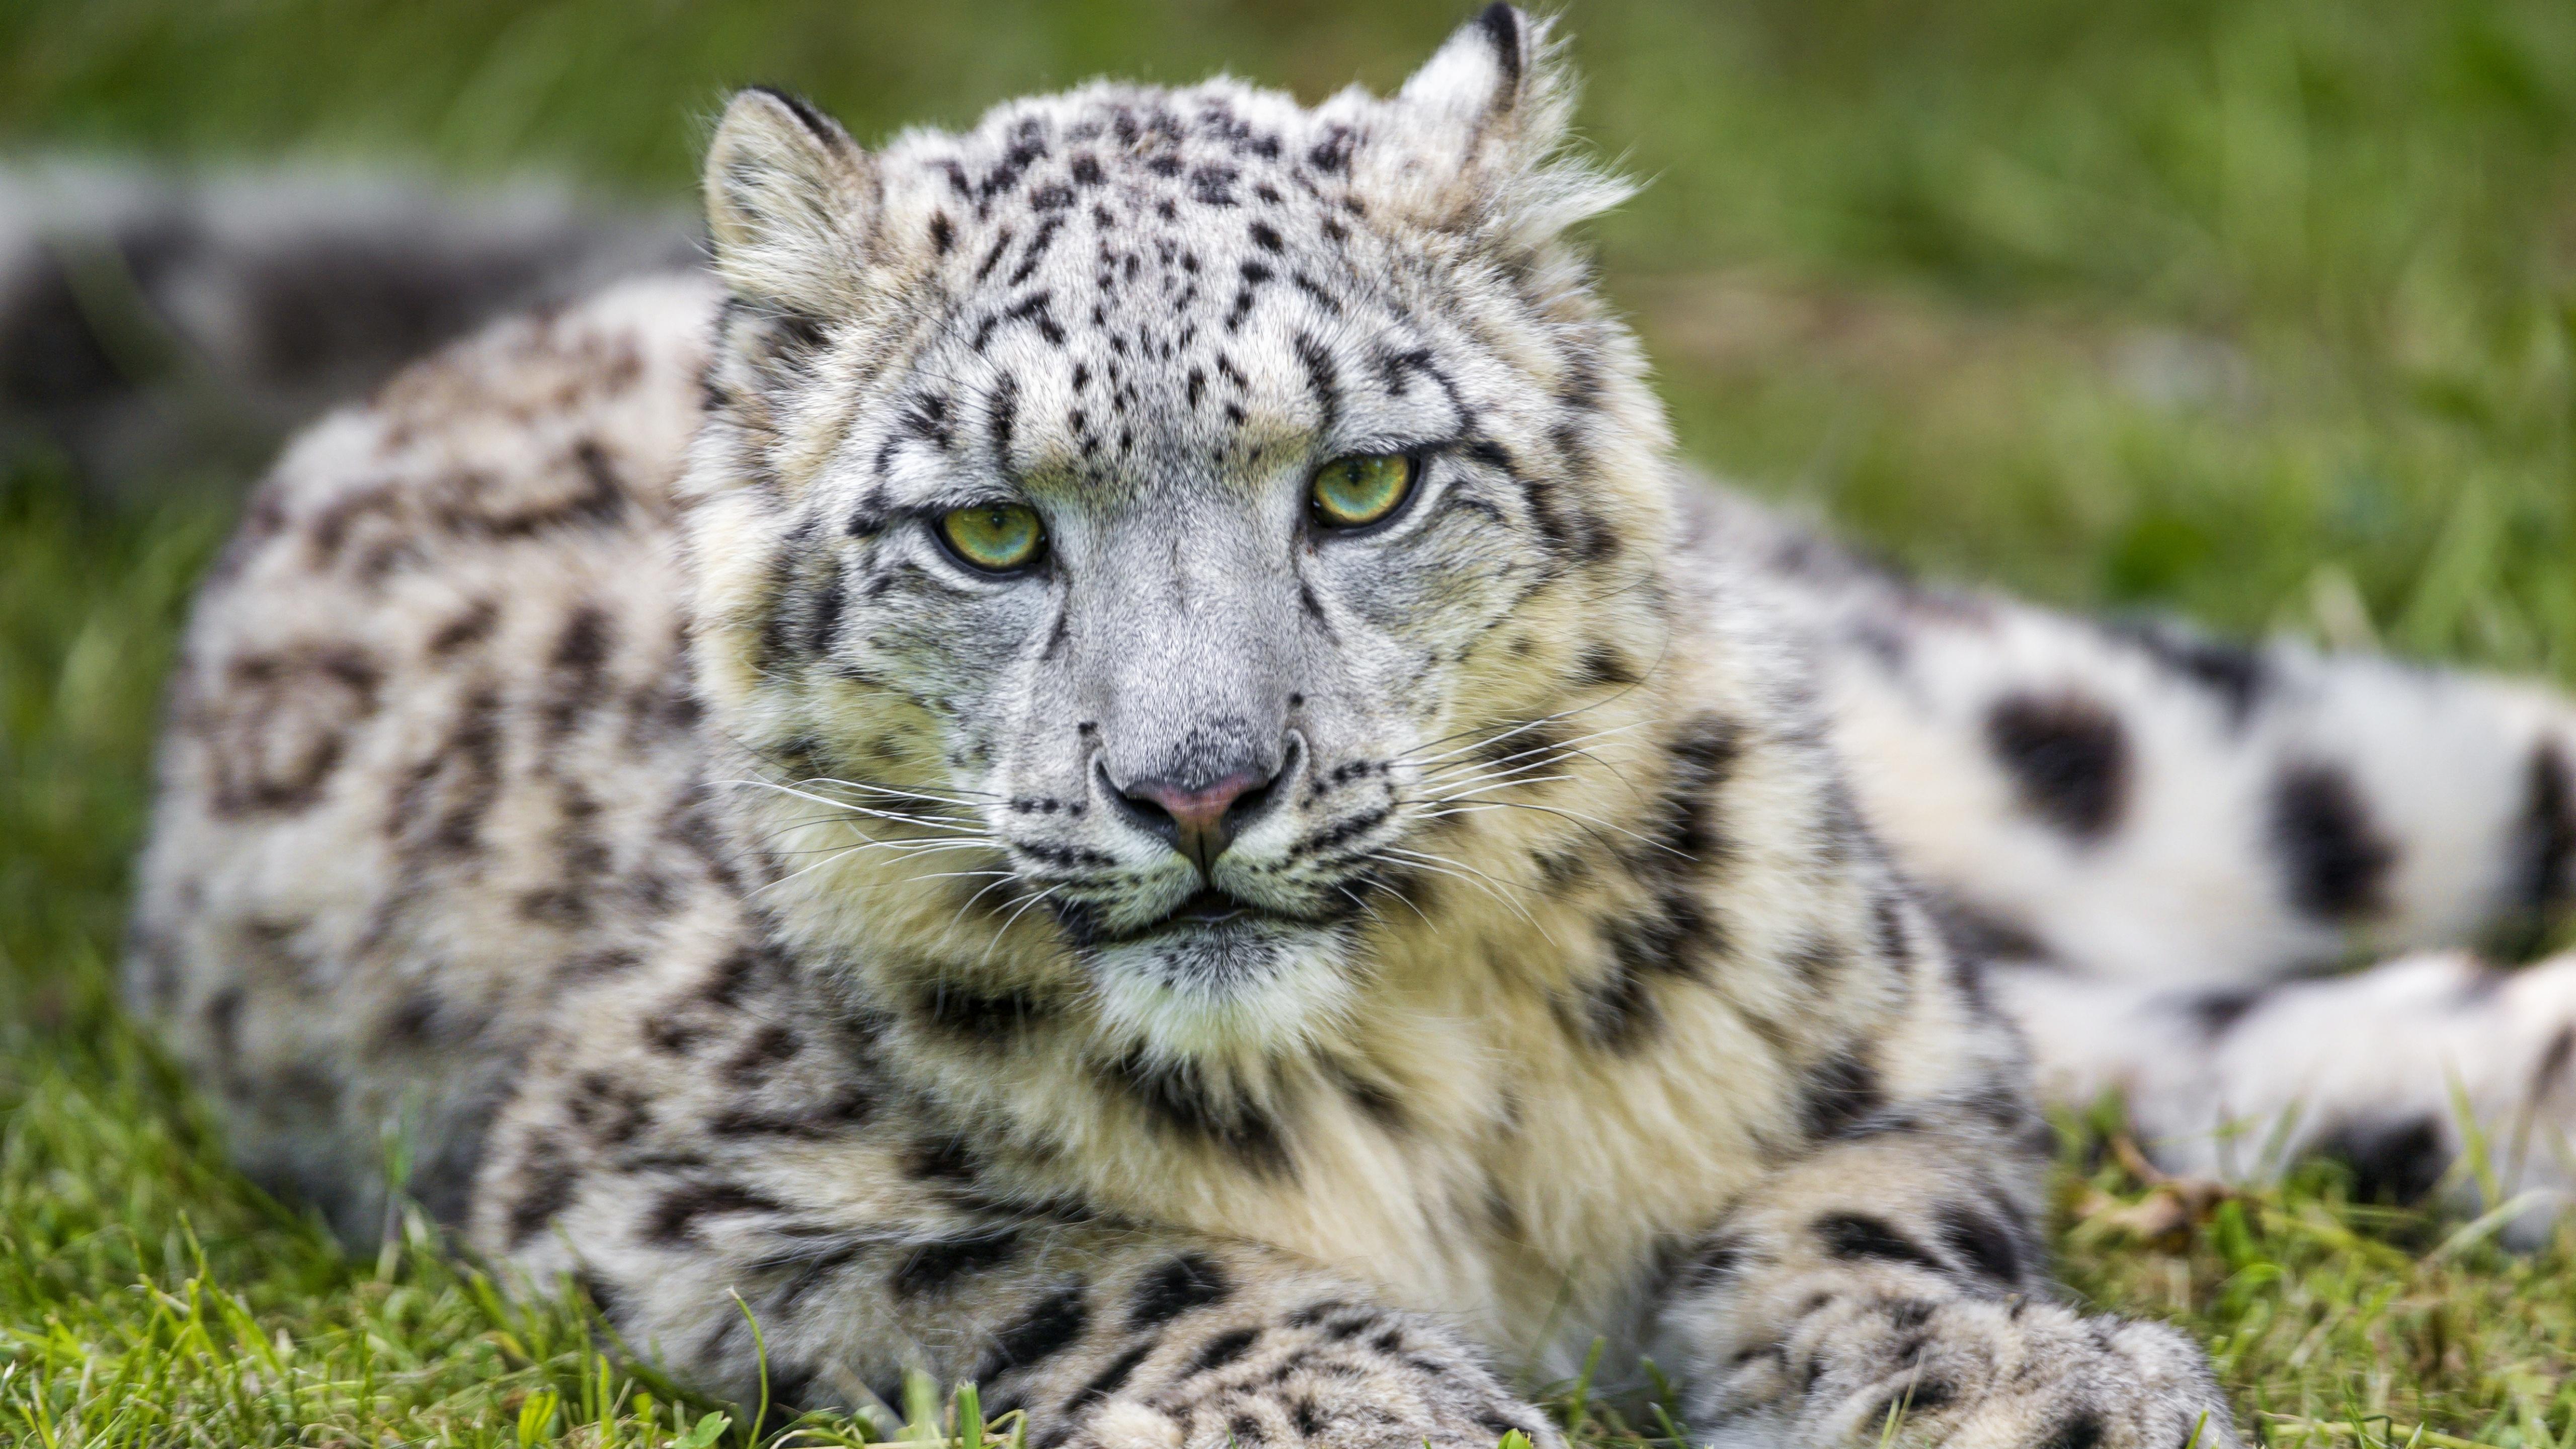 Snow Leopard 4k Wallpaper White Green Grass Big Cat Wild Animal Predator Carnivore Stare 5k Animals 2862